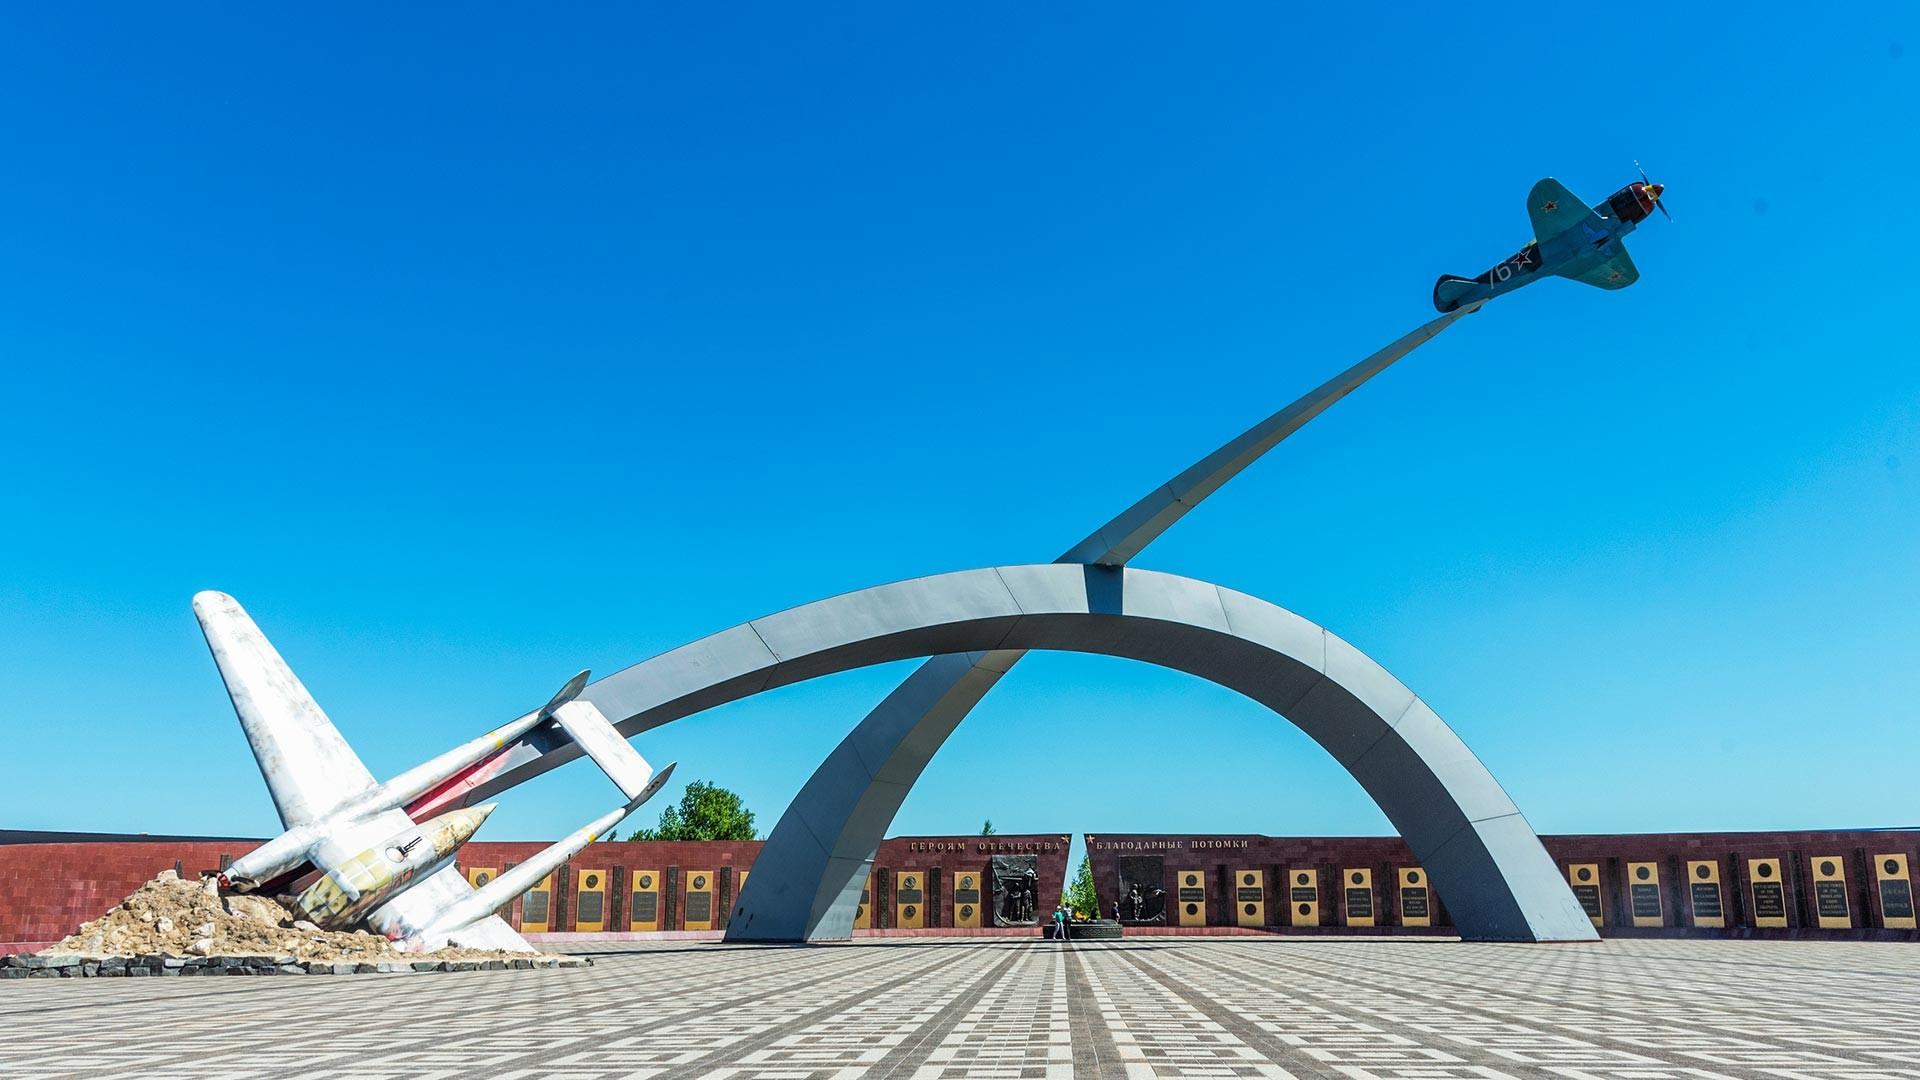 Мемориал «Защитникам неба Отечества» в Туле.